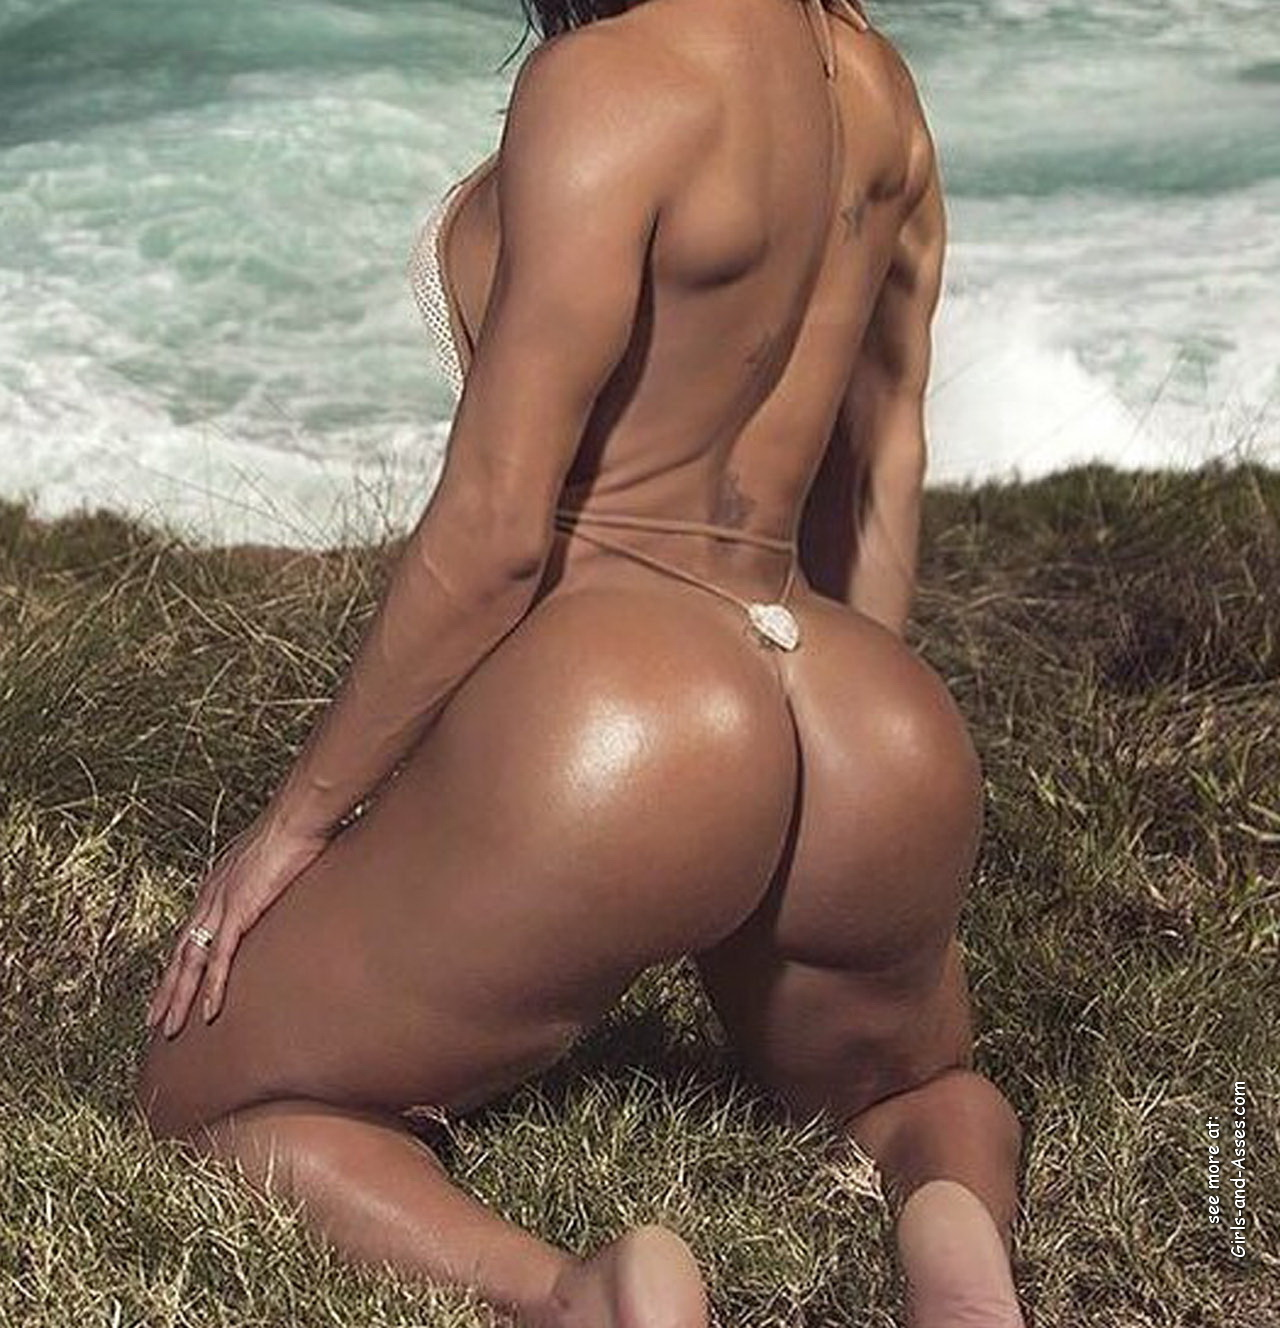 big booty naked latina women at the beach photo 02541